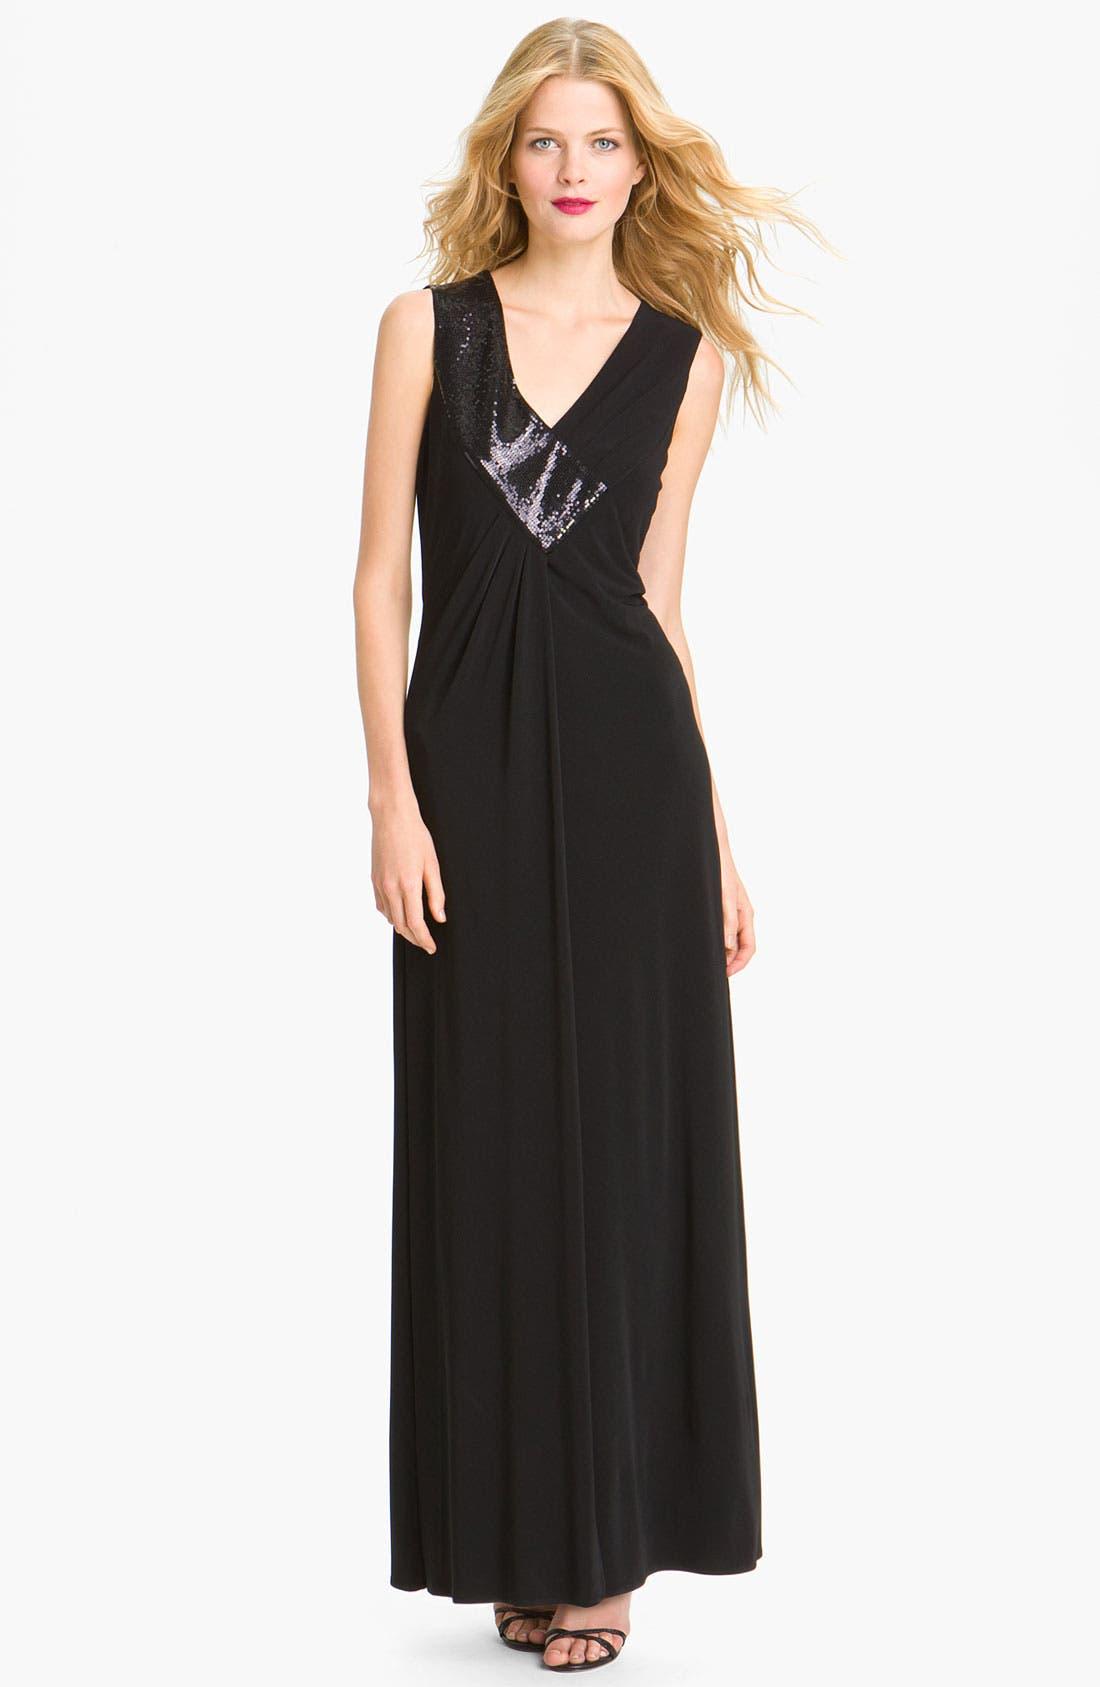 Alternate Image 1 Selected - Calvin Klein Sequin Trim V-Neck Jersey Gown